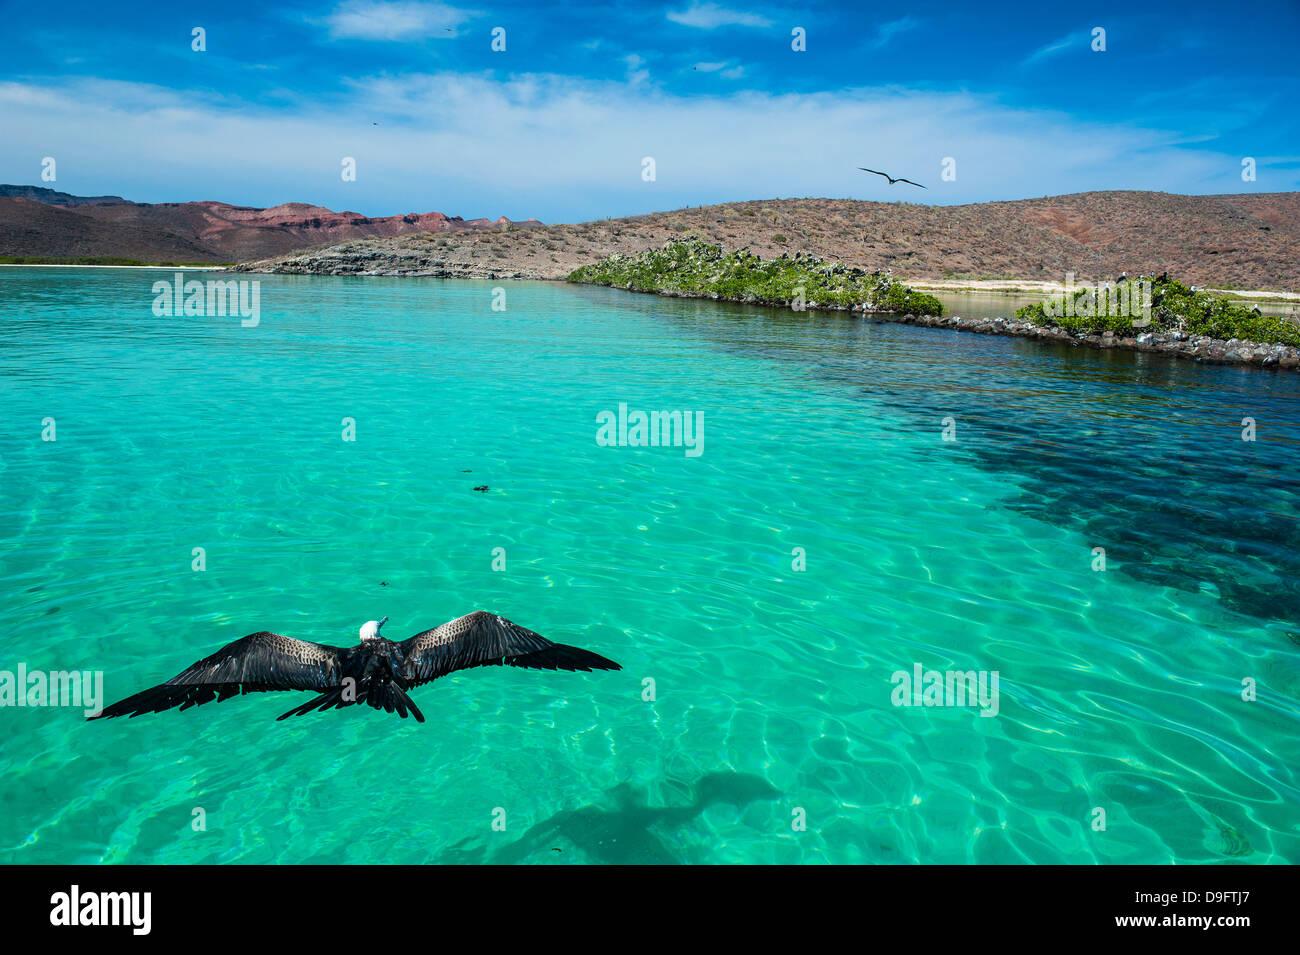 Frigate bird and the turquoise waters of Isla Espiritu Santo, Baja California, Mexico - Stock Image